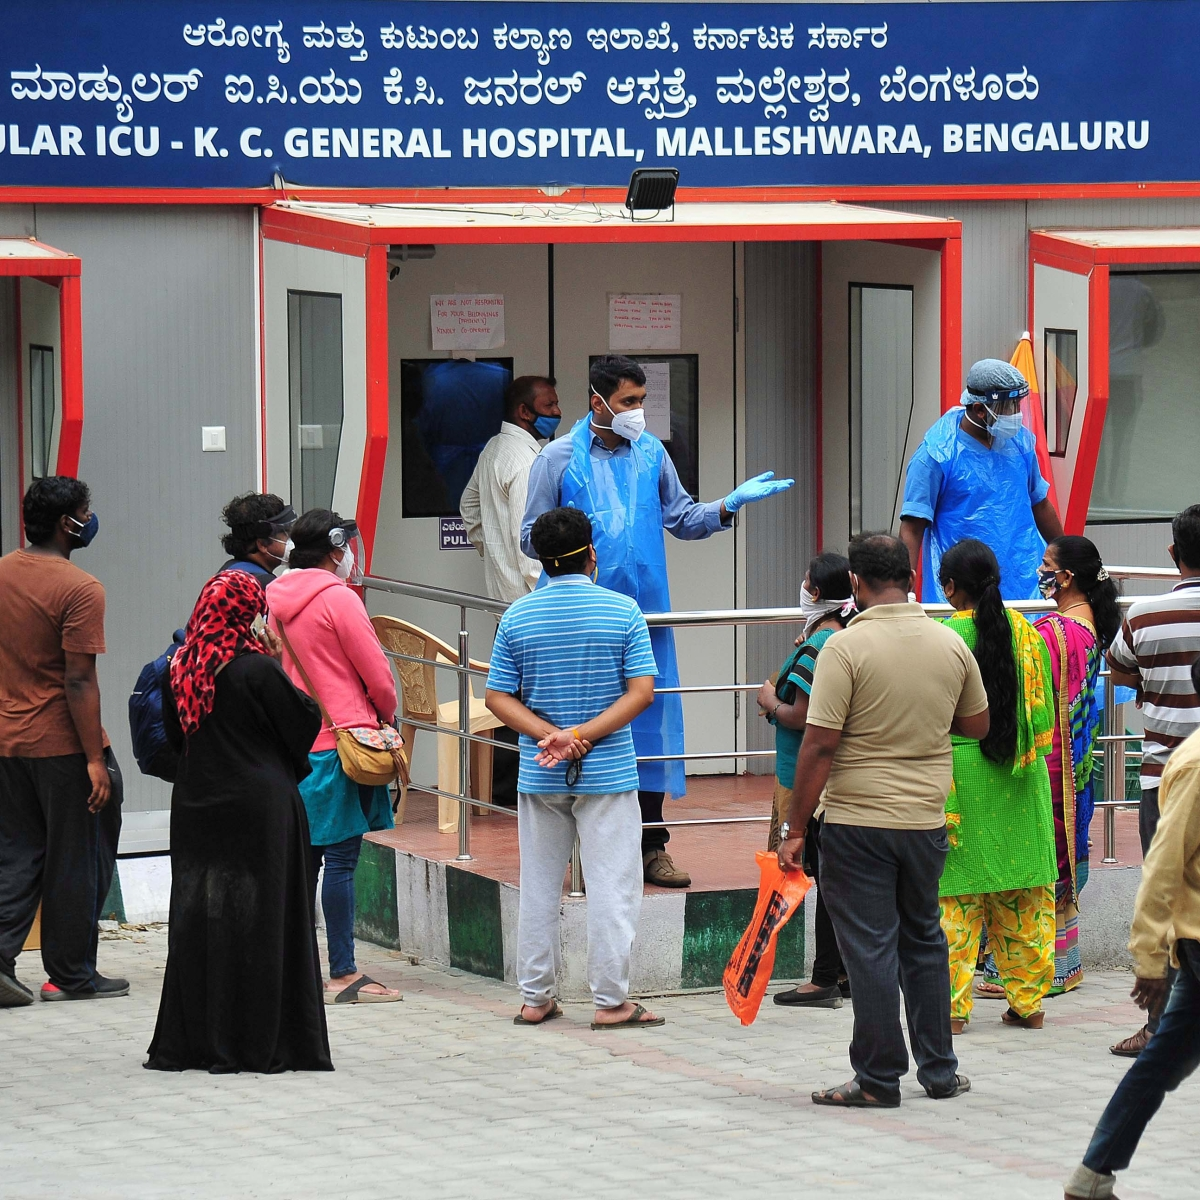 Black fungus notifiable disease, hospitals should inform govt before treatment: Karnataka Deputy CM